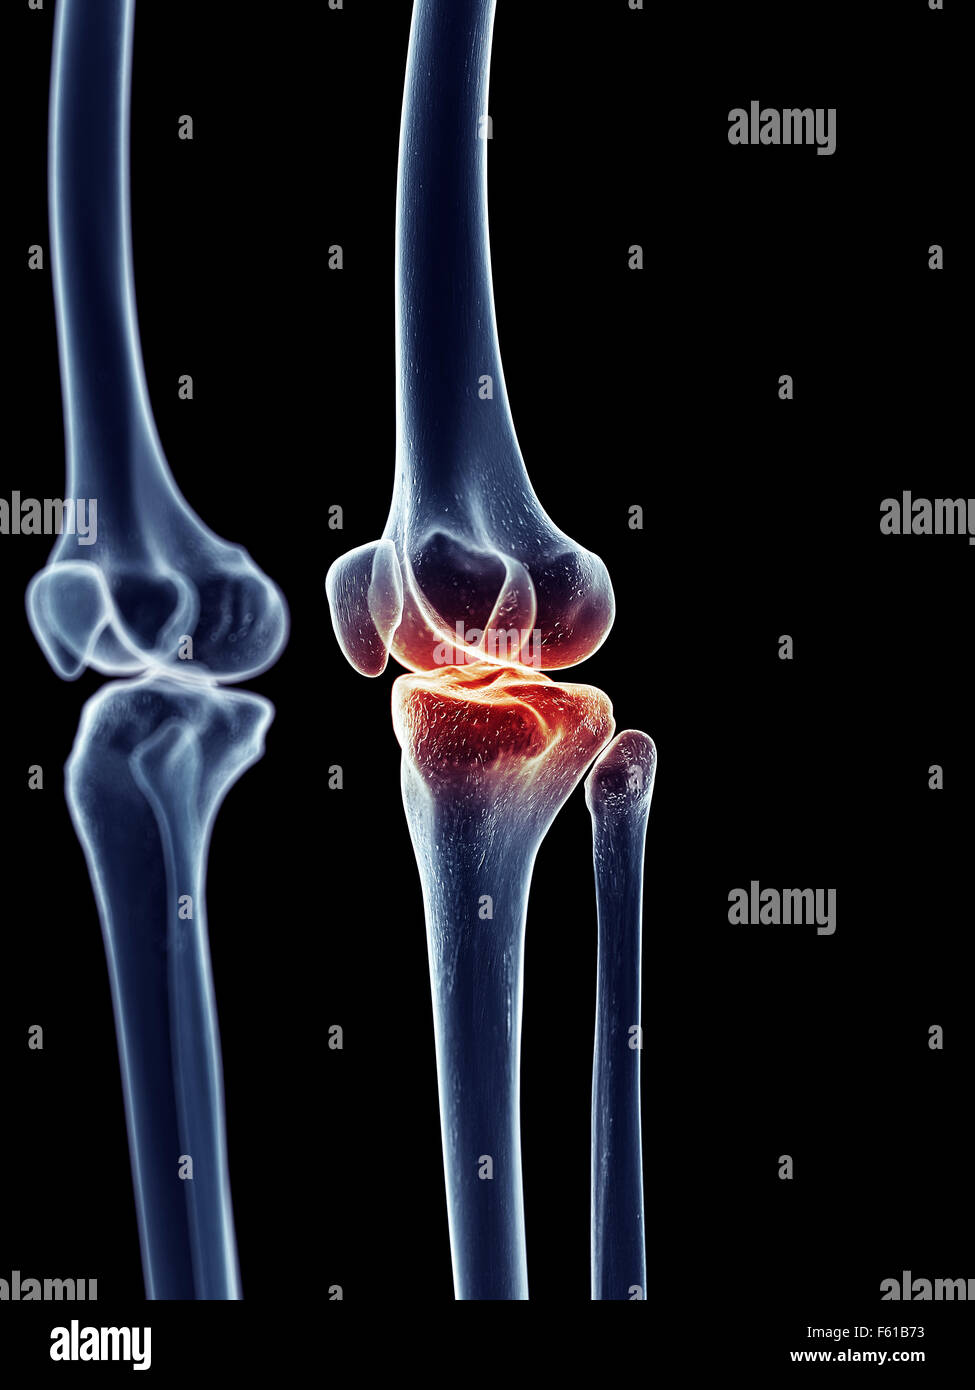 Human Knee Stockfotos & Human Knee Bilder - Alamy